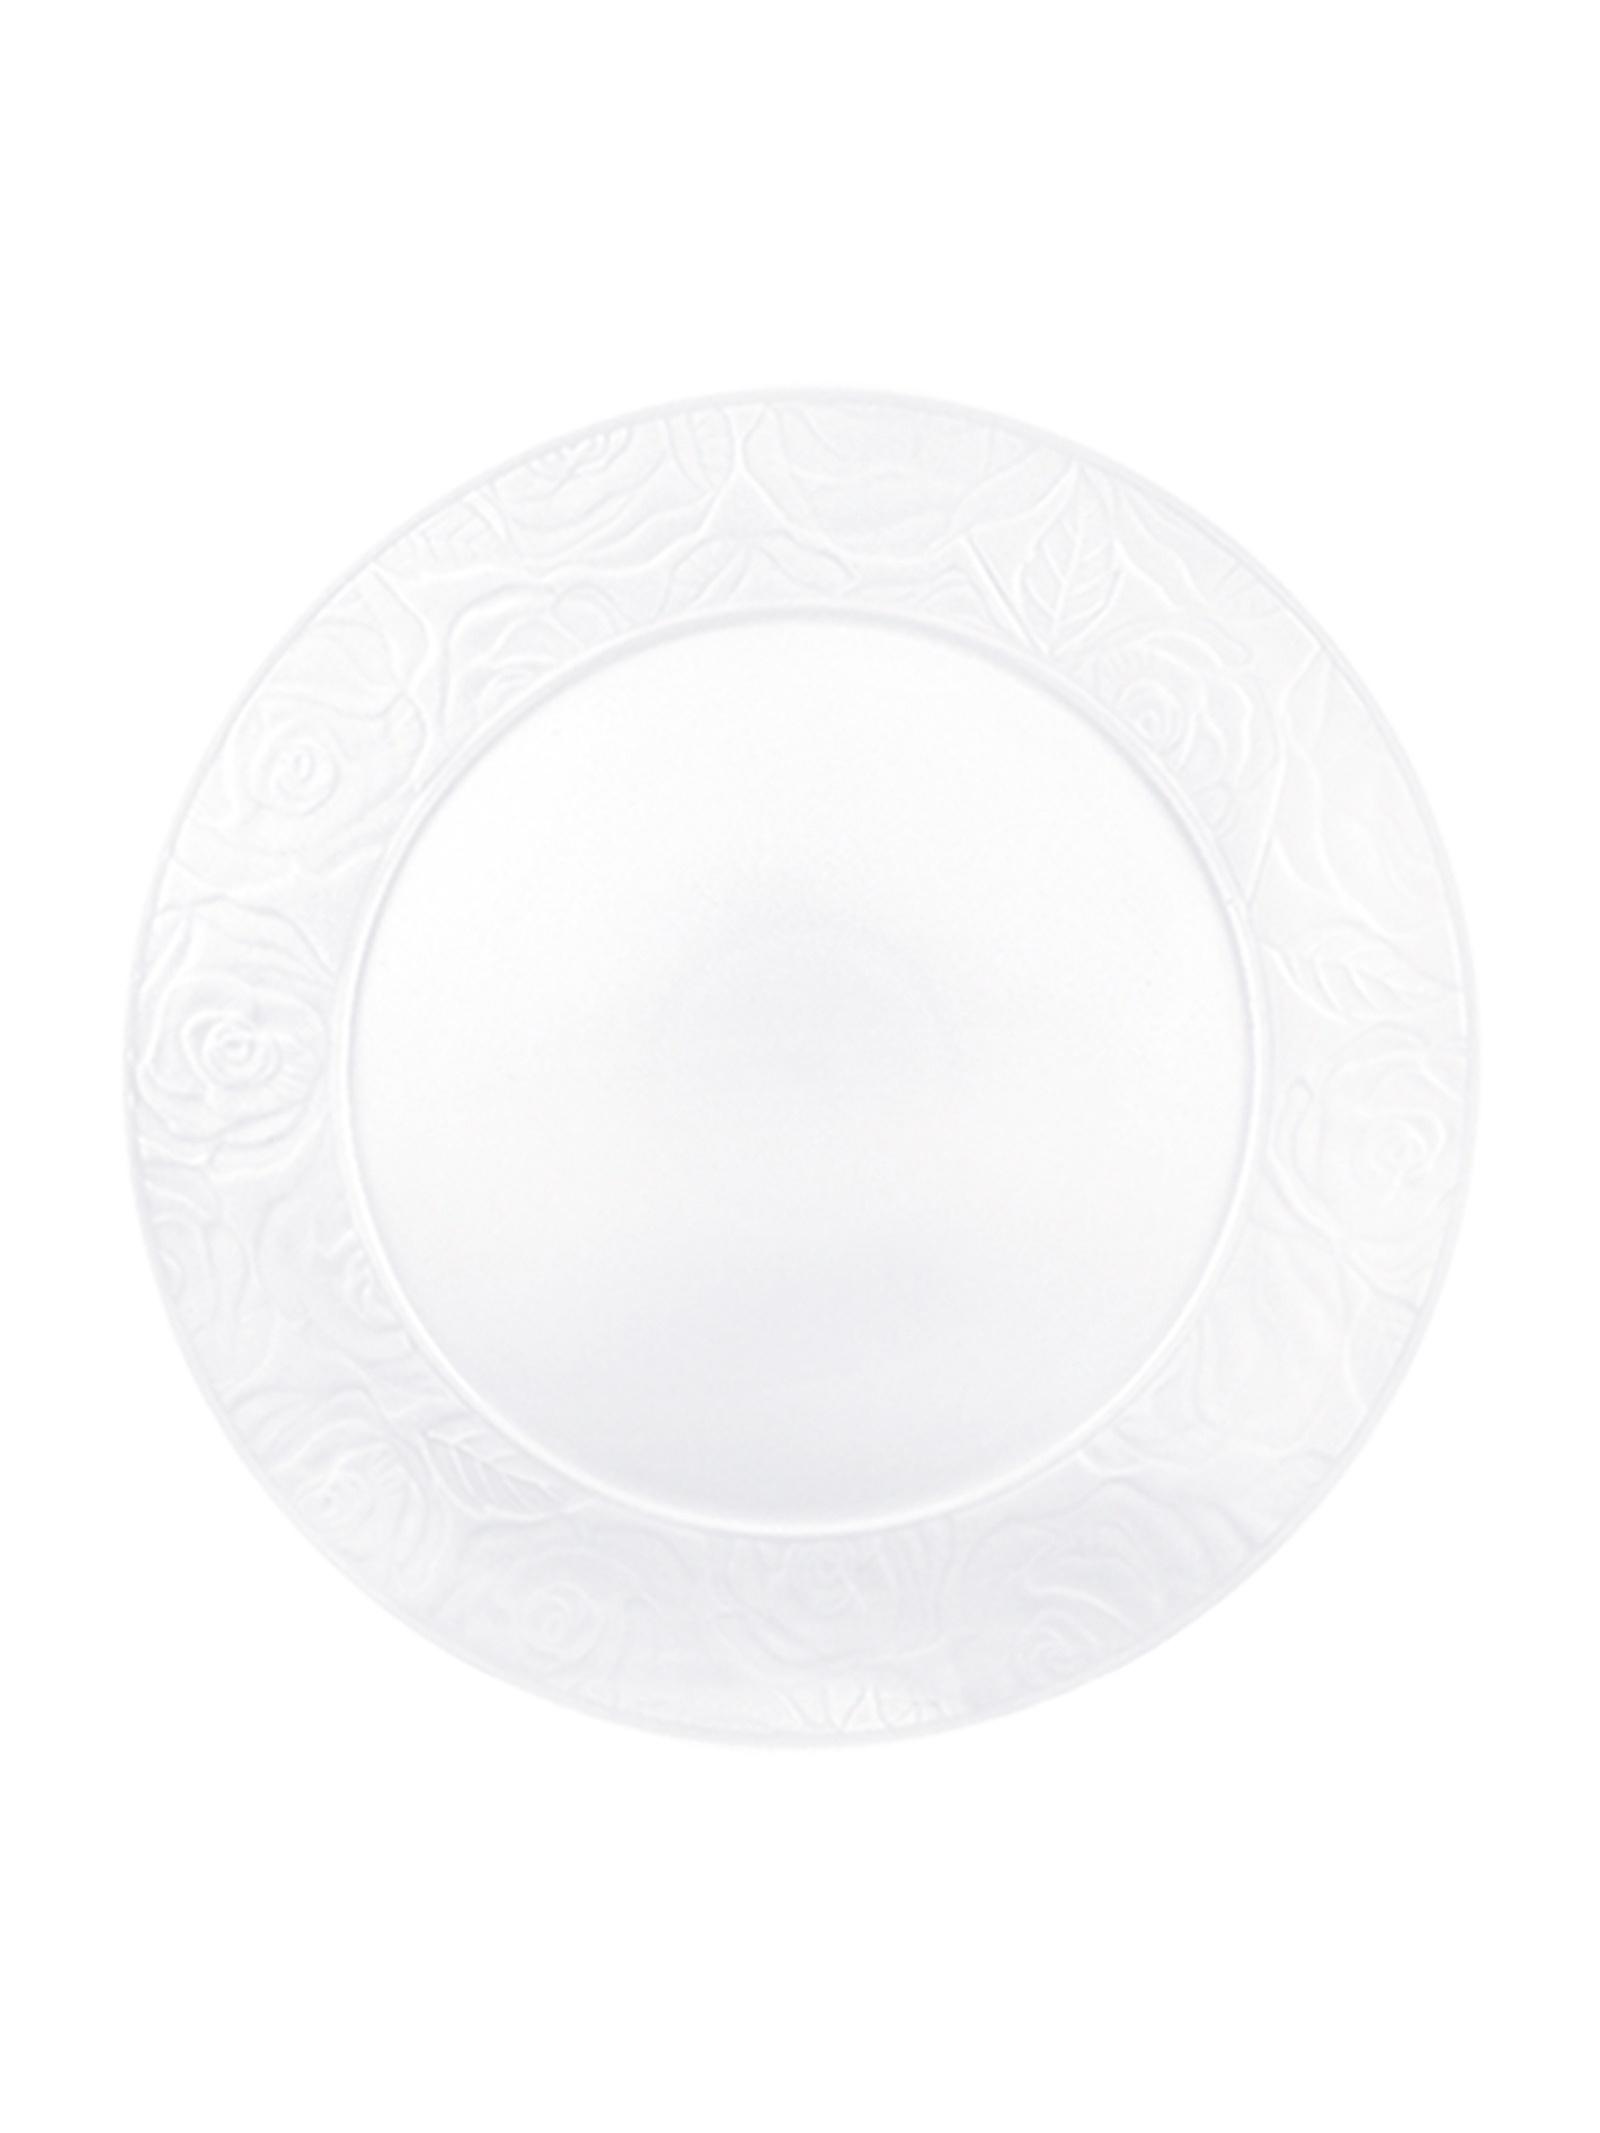 Тарелка десертная Коралл 949992, Керамика тарелка десертная ломоносовская керамика диаметр 21 см